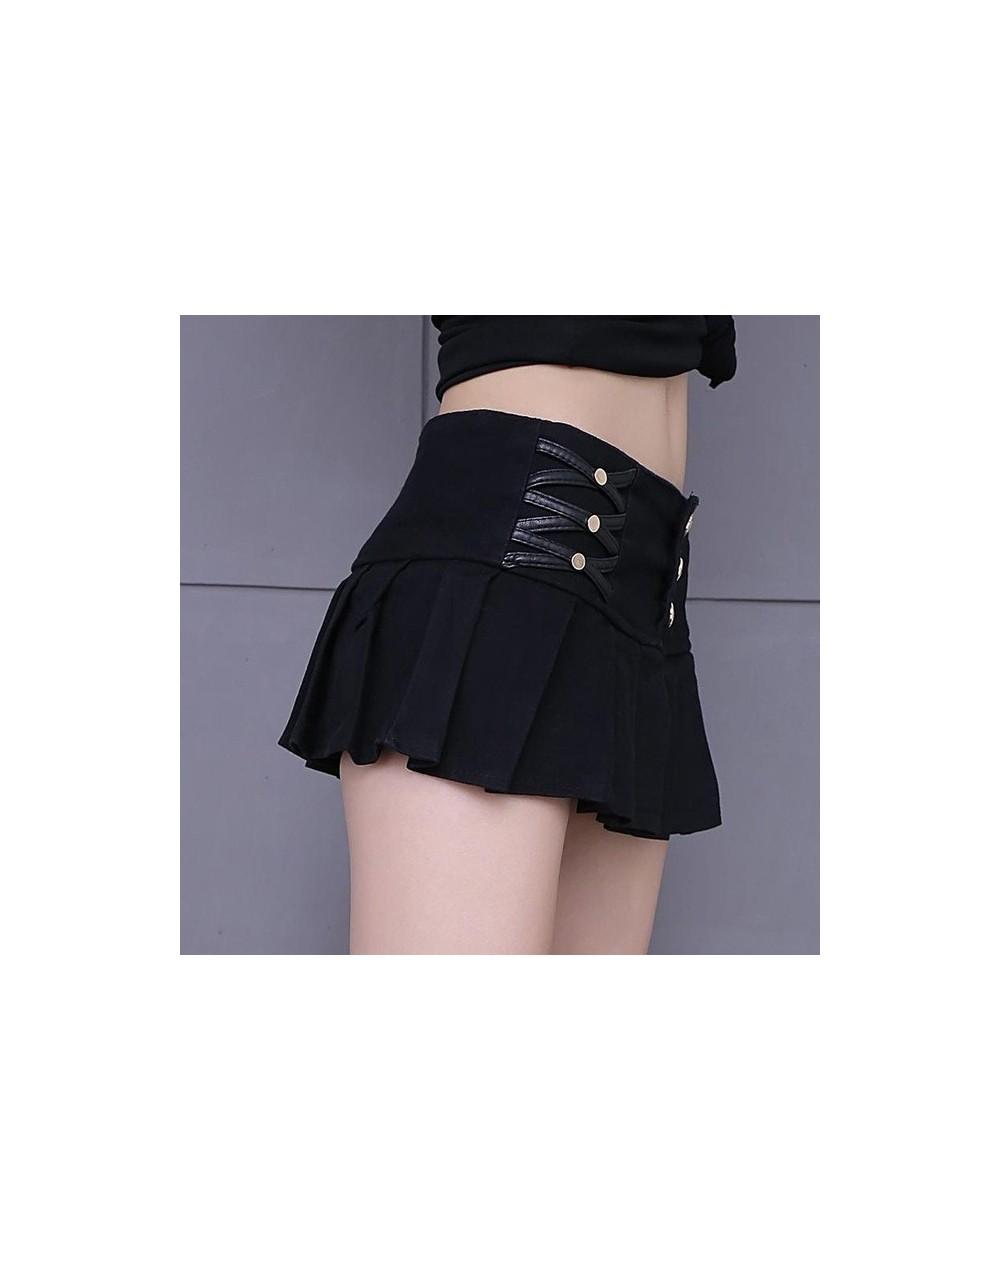 Elasticity Waist Pleated Skirt Shorts Women 2018 New Summer Style All-match Black White Stretch Hotpant Miniskirt Micro Shor...